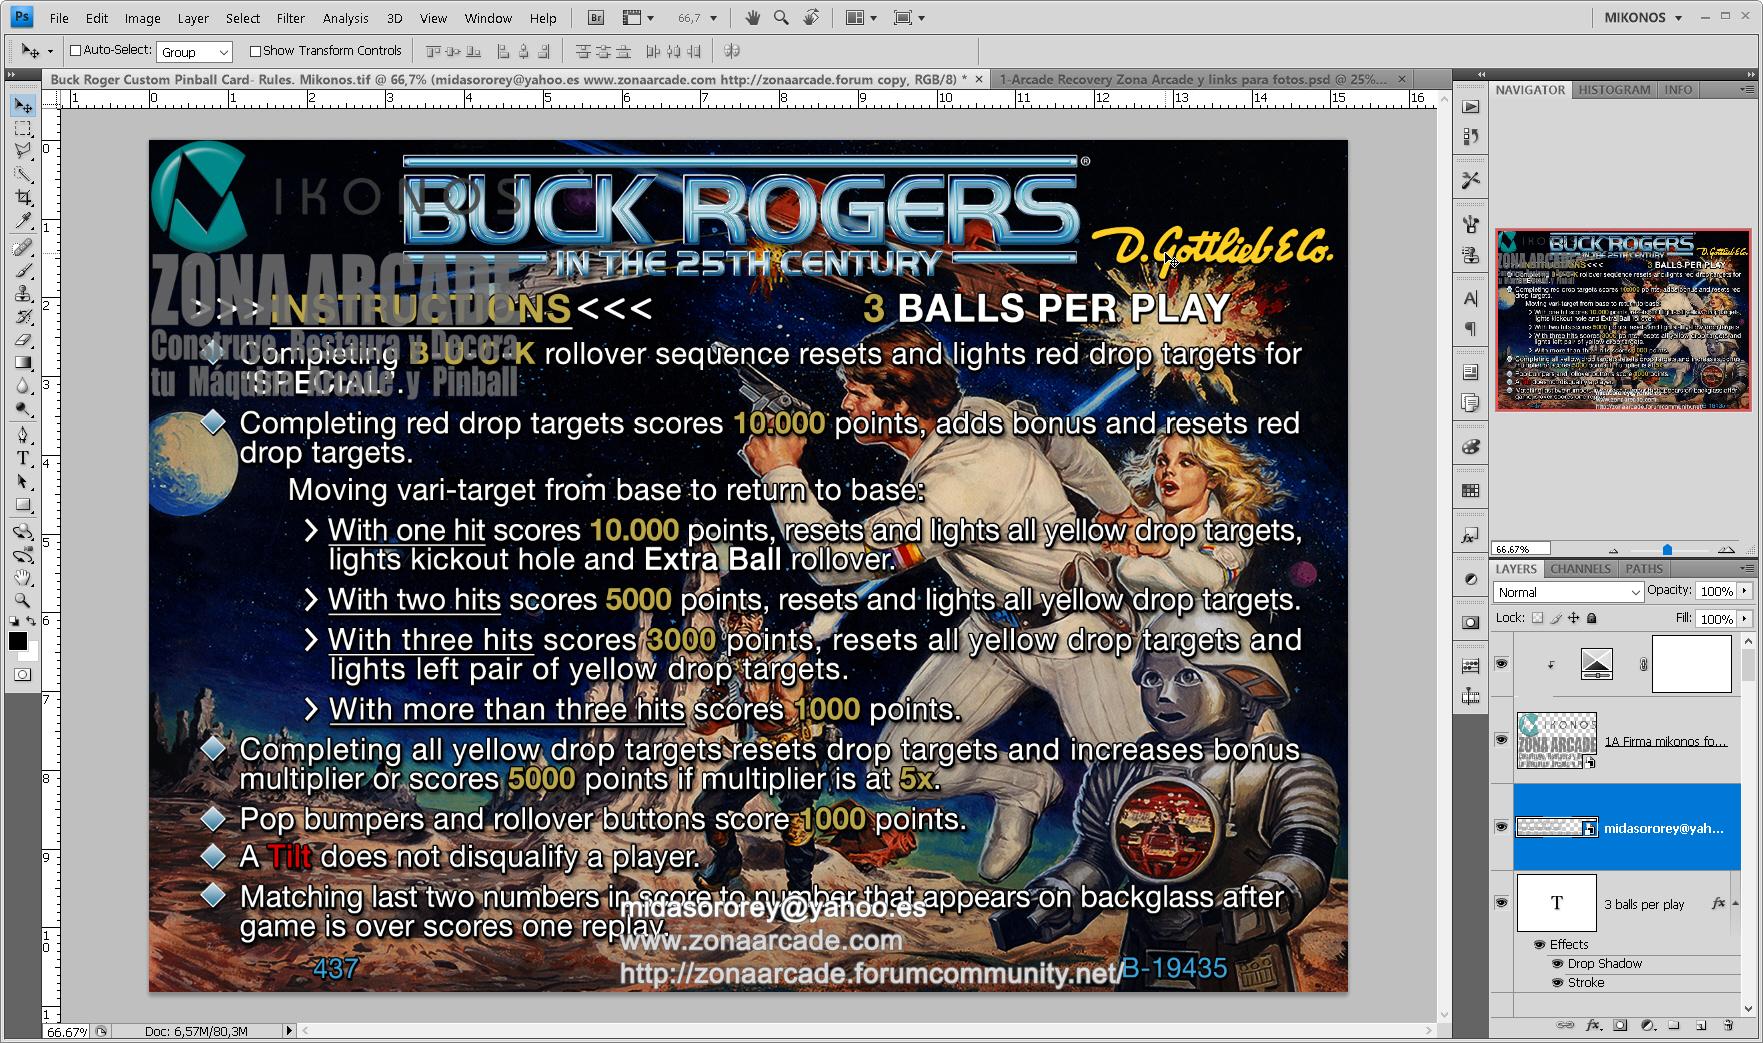 Buck Rogers Pinball Card Customized - Rules. Mikonos1